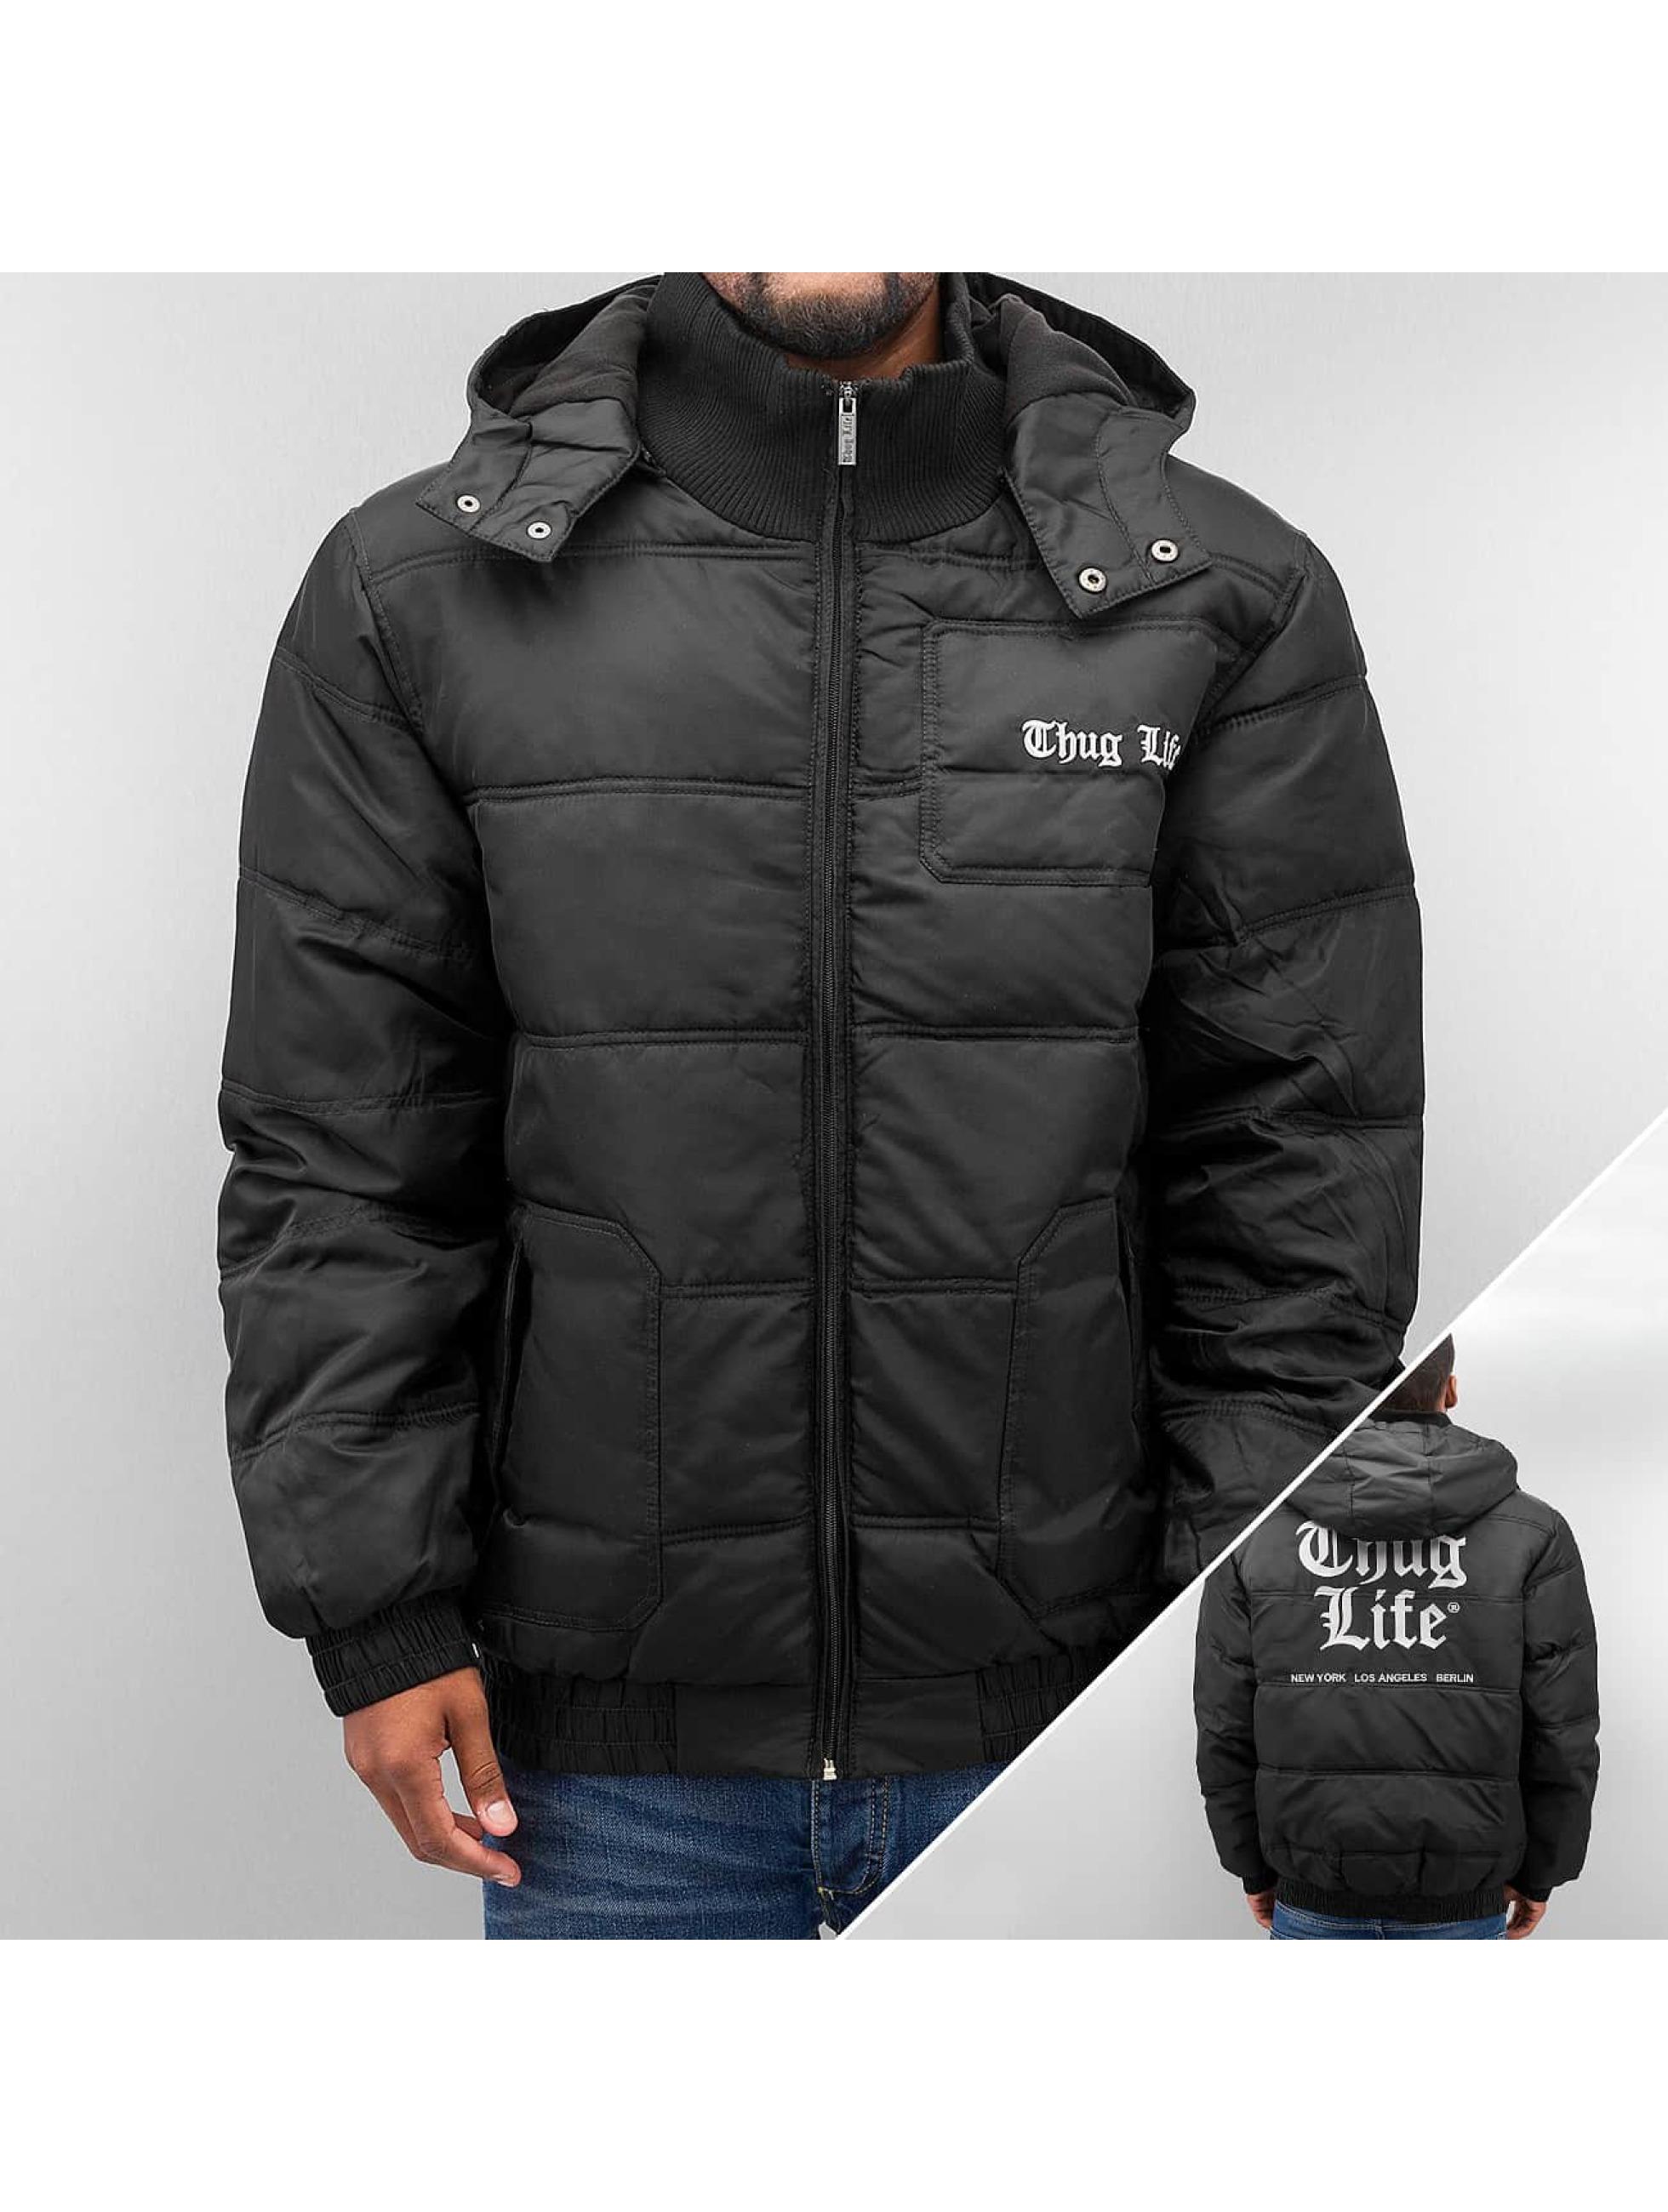 Thug Life Street Dreams Hustler Jacket Black Black